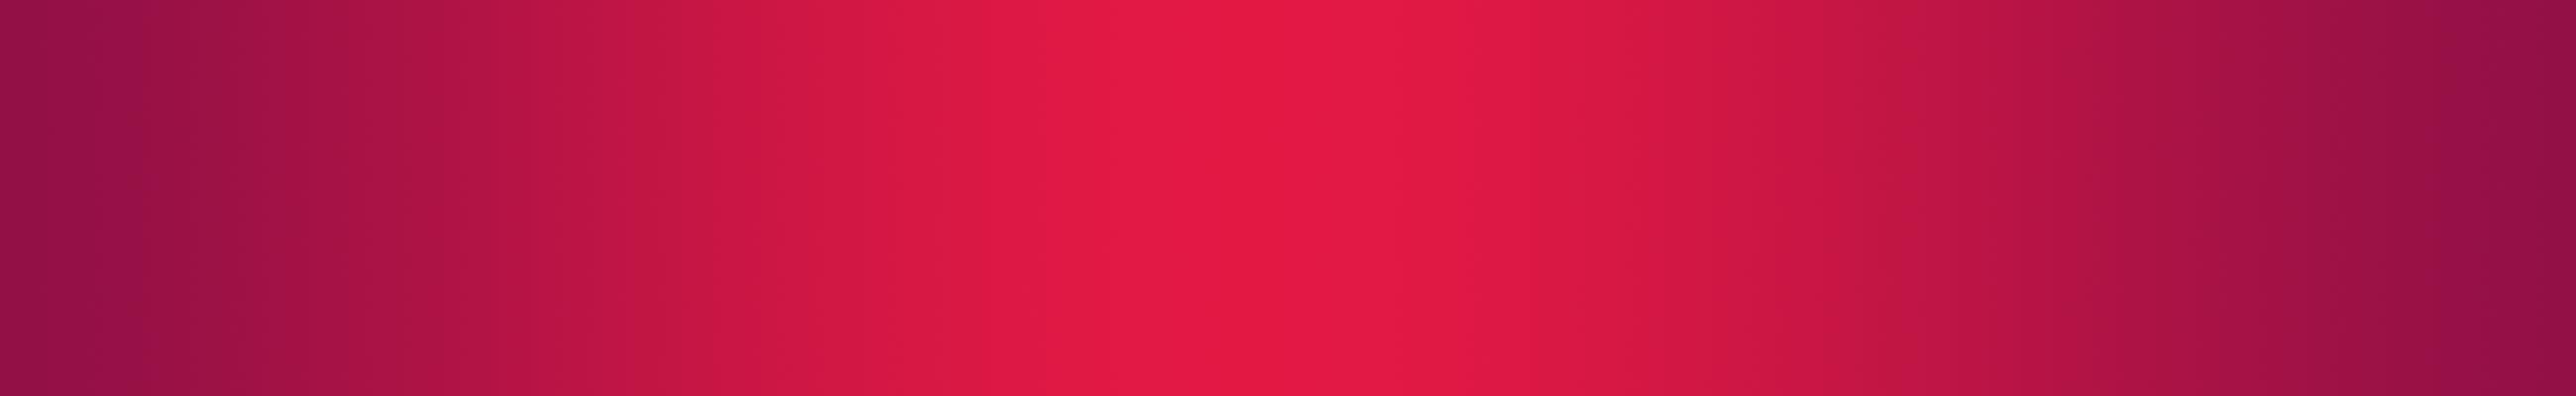 redbanner